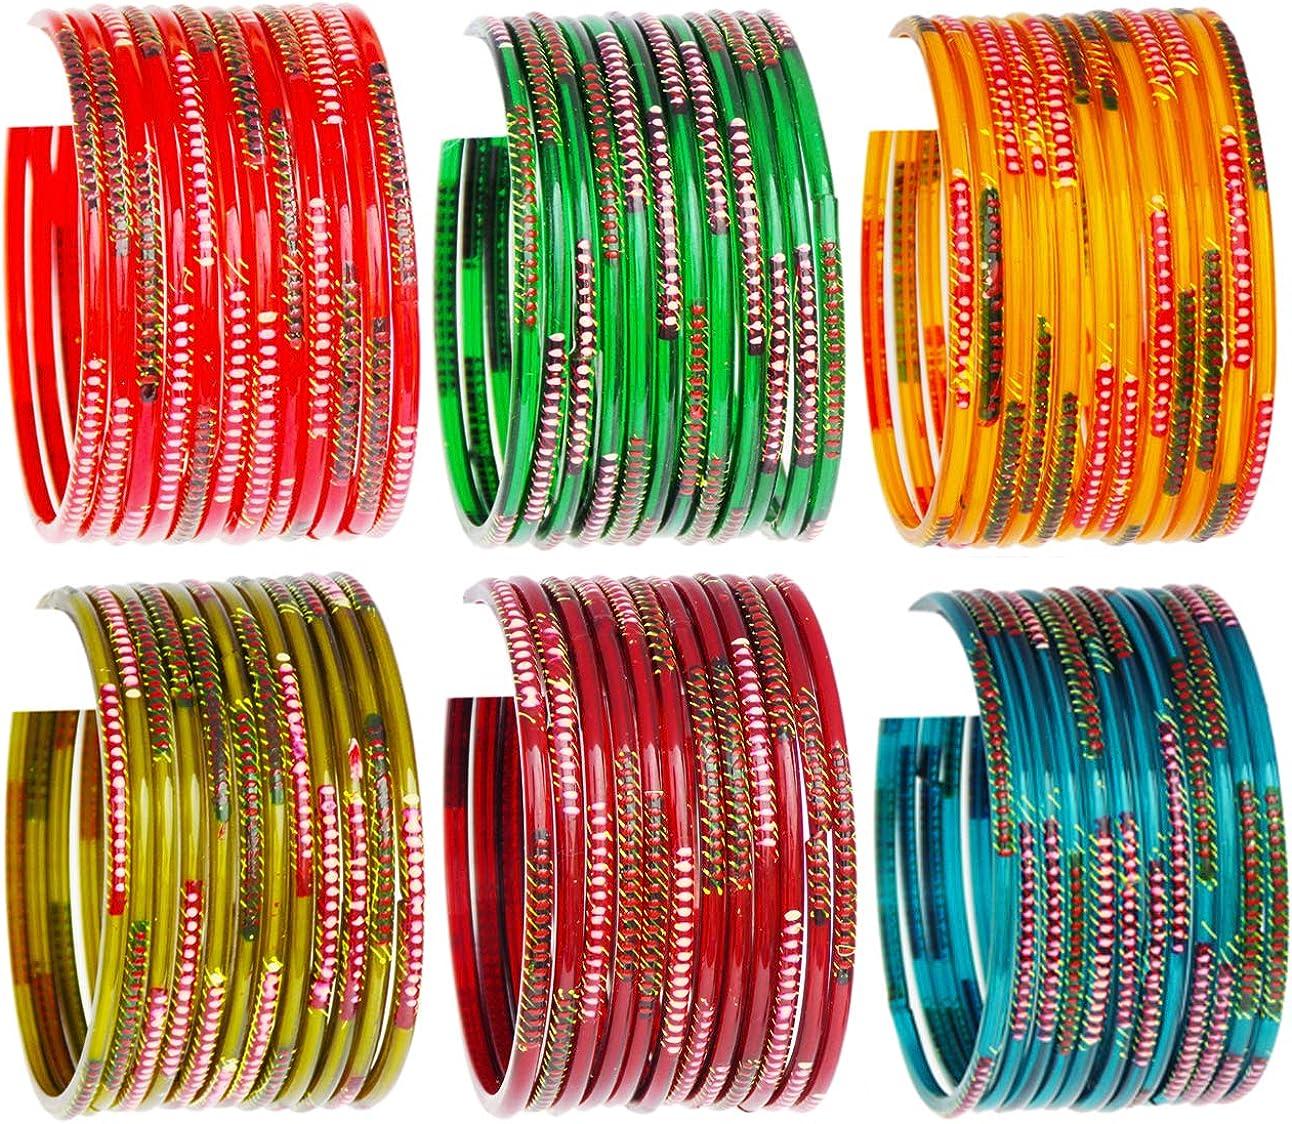 JD'Z COLLECTION Indian Jewelry Bangles Set Bollywood Style Bangle Bridal Ethnic Dailywear Glass Bangles Set